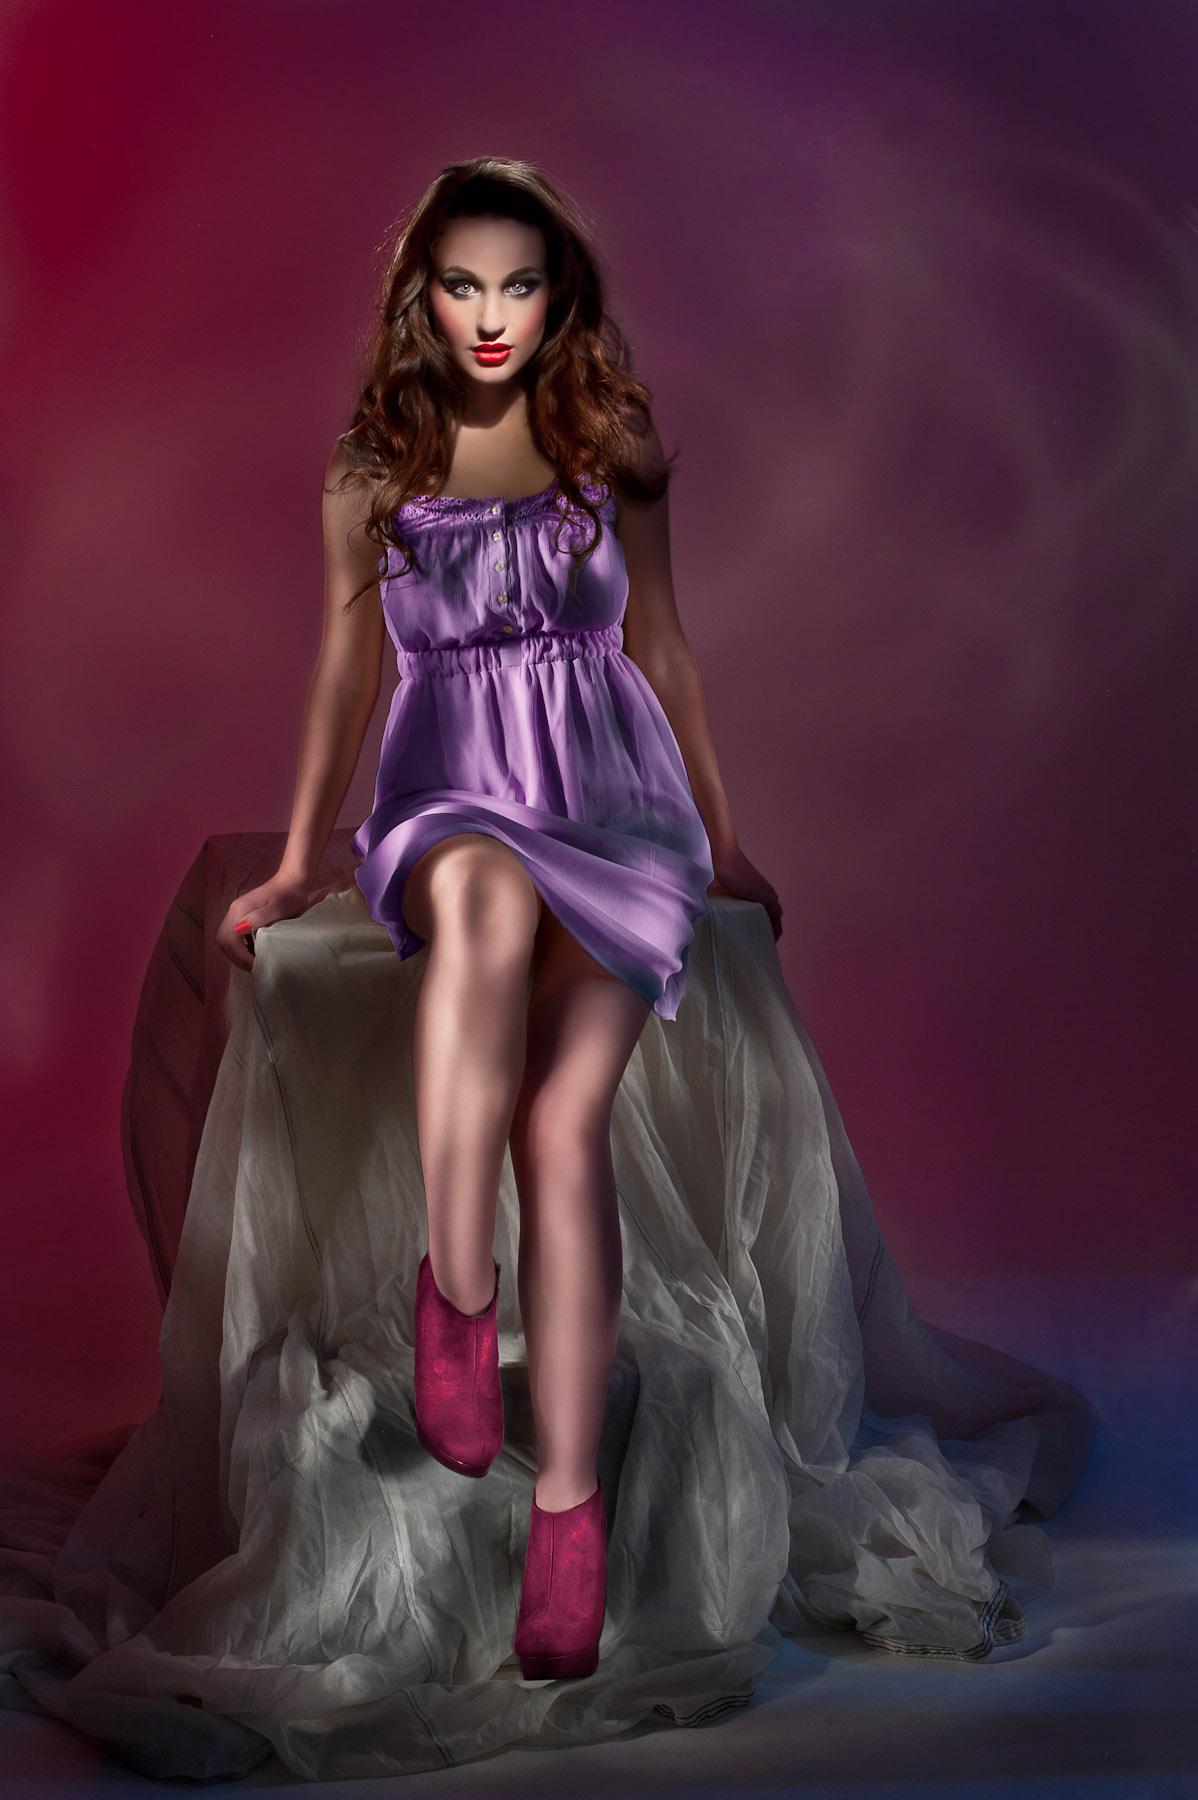 Katie-6471c-Purple dress